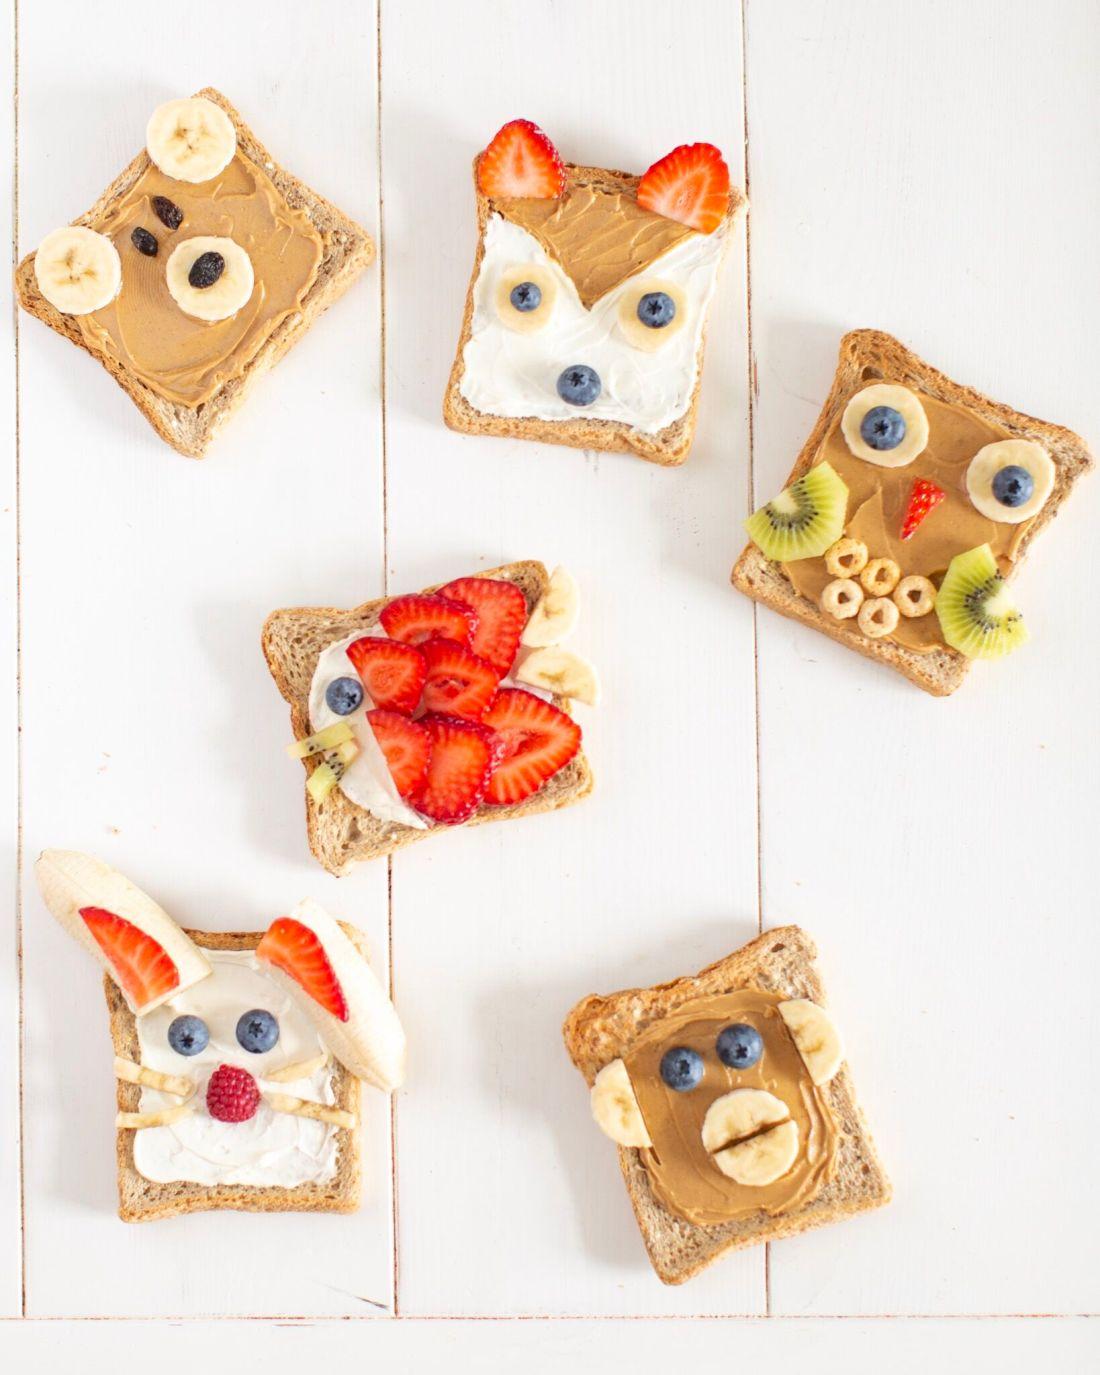 How to make animal toast